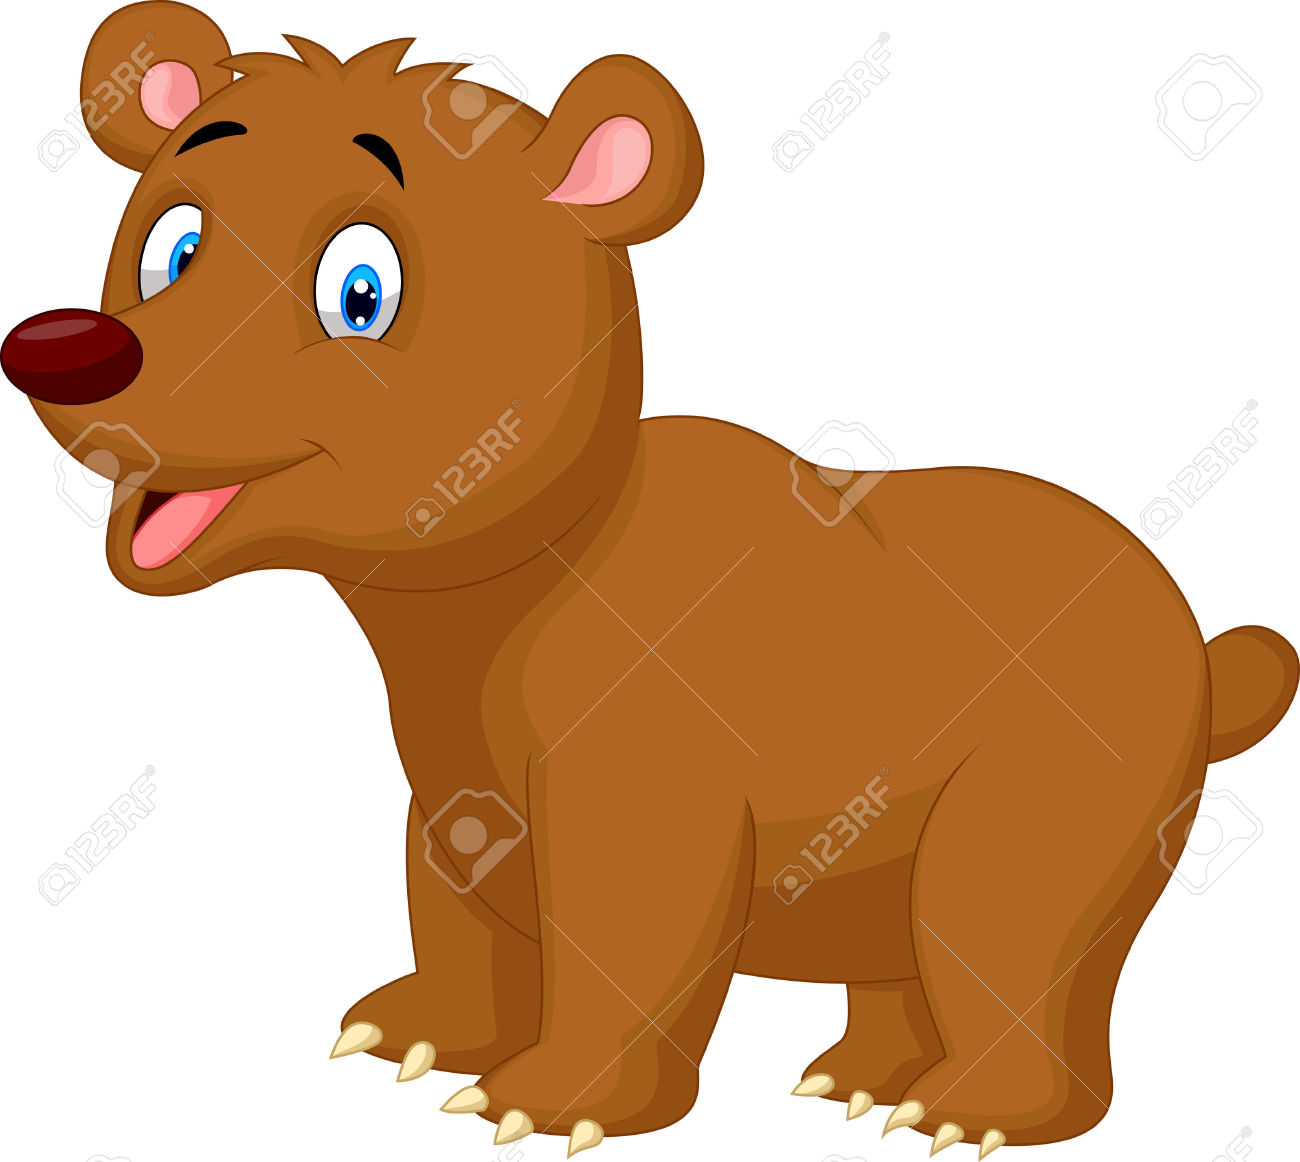 Cute Brown Bear Cartoon Royalty Free Cliparts, Vectors, And Stock.